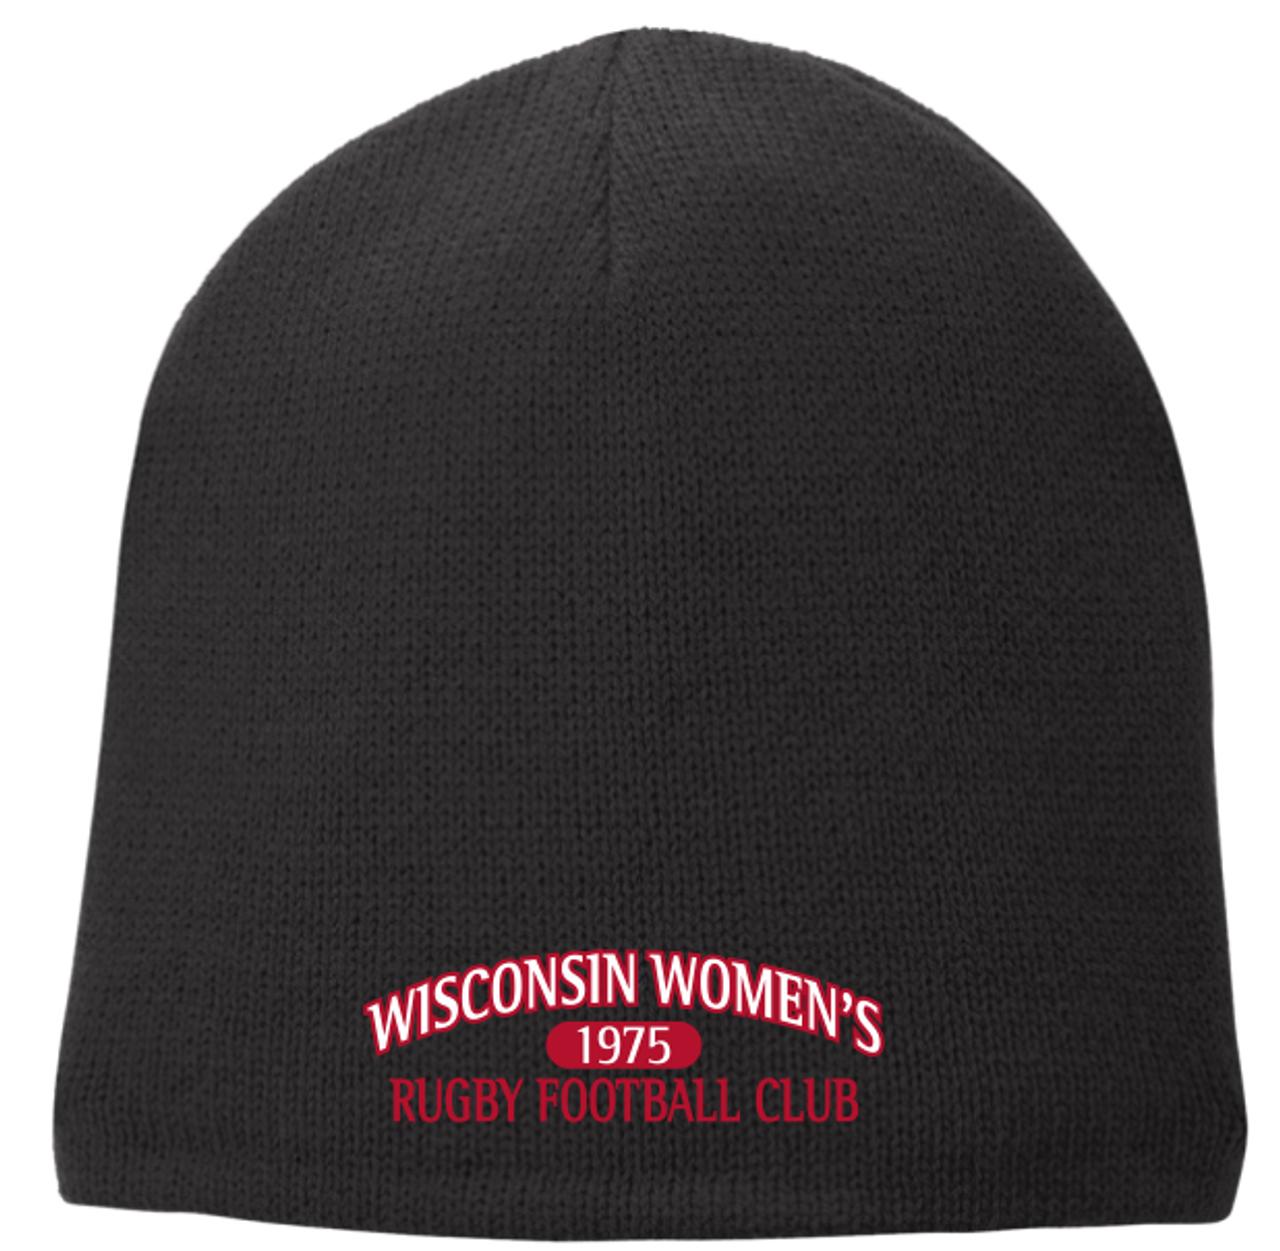 Wisconsin WRFC Fleece-Lined Beanie